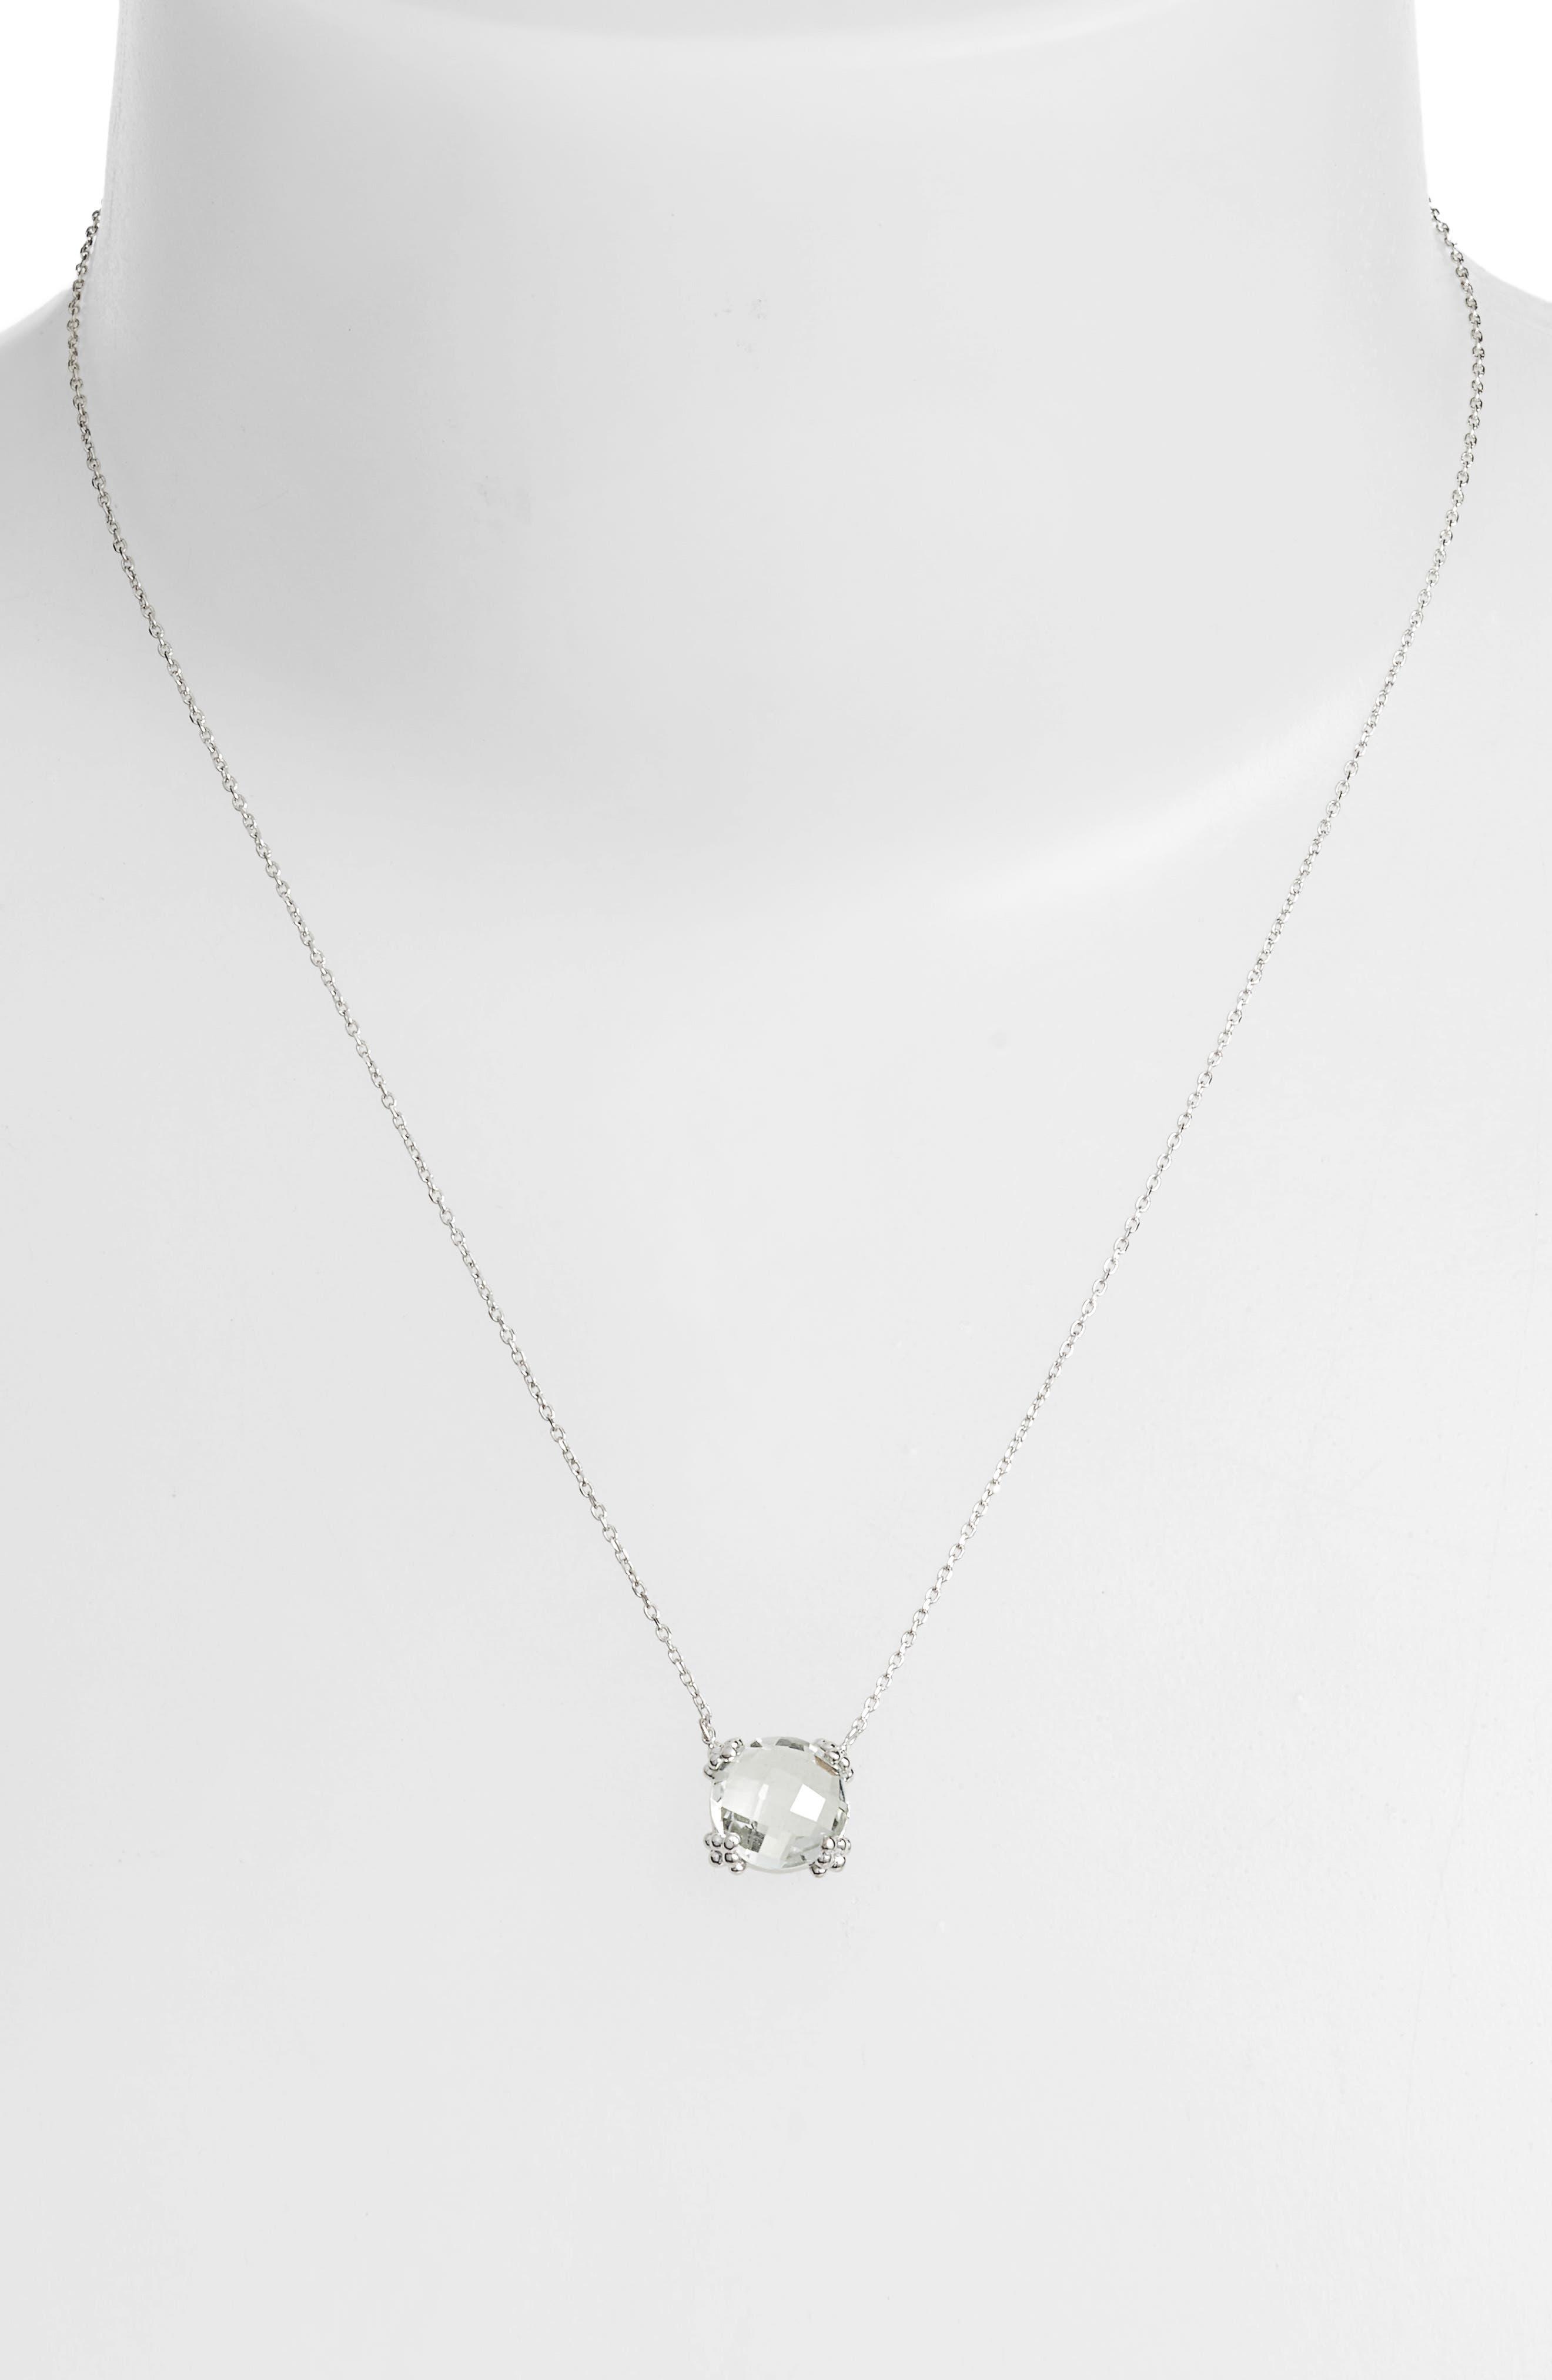 Dew Drop Cluster Topaz Pendant Necklace,                             Alternate thumbnail 2, color,                             GREEN AMETHYST